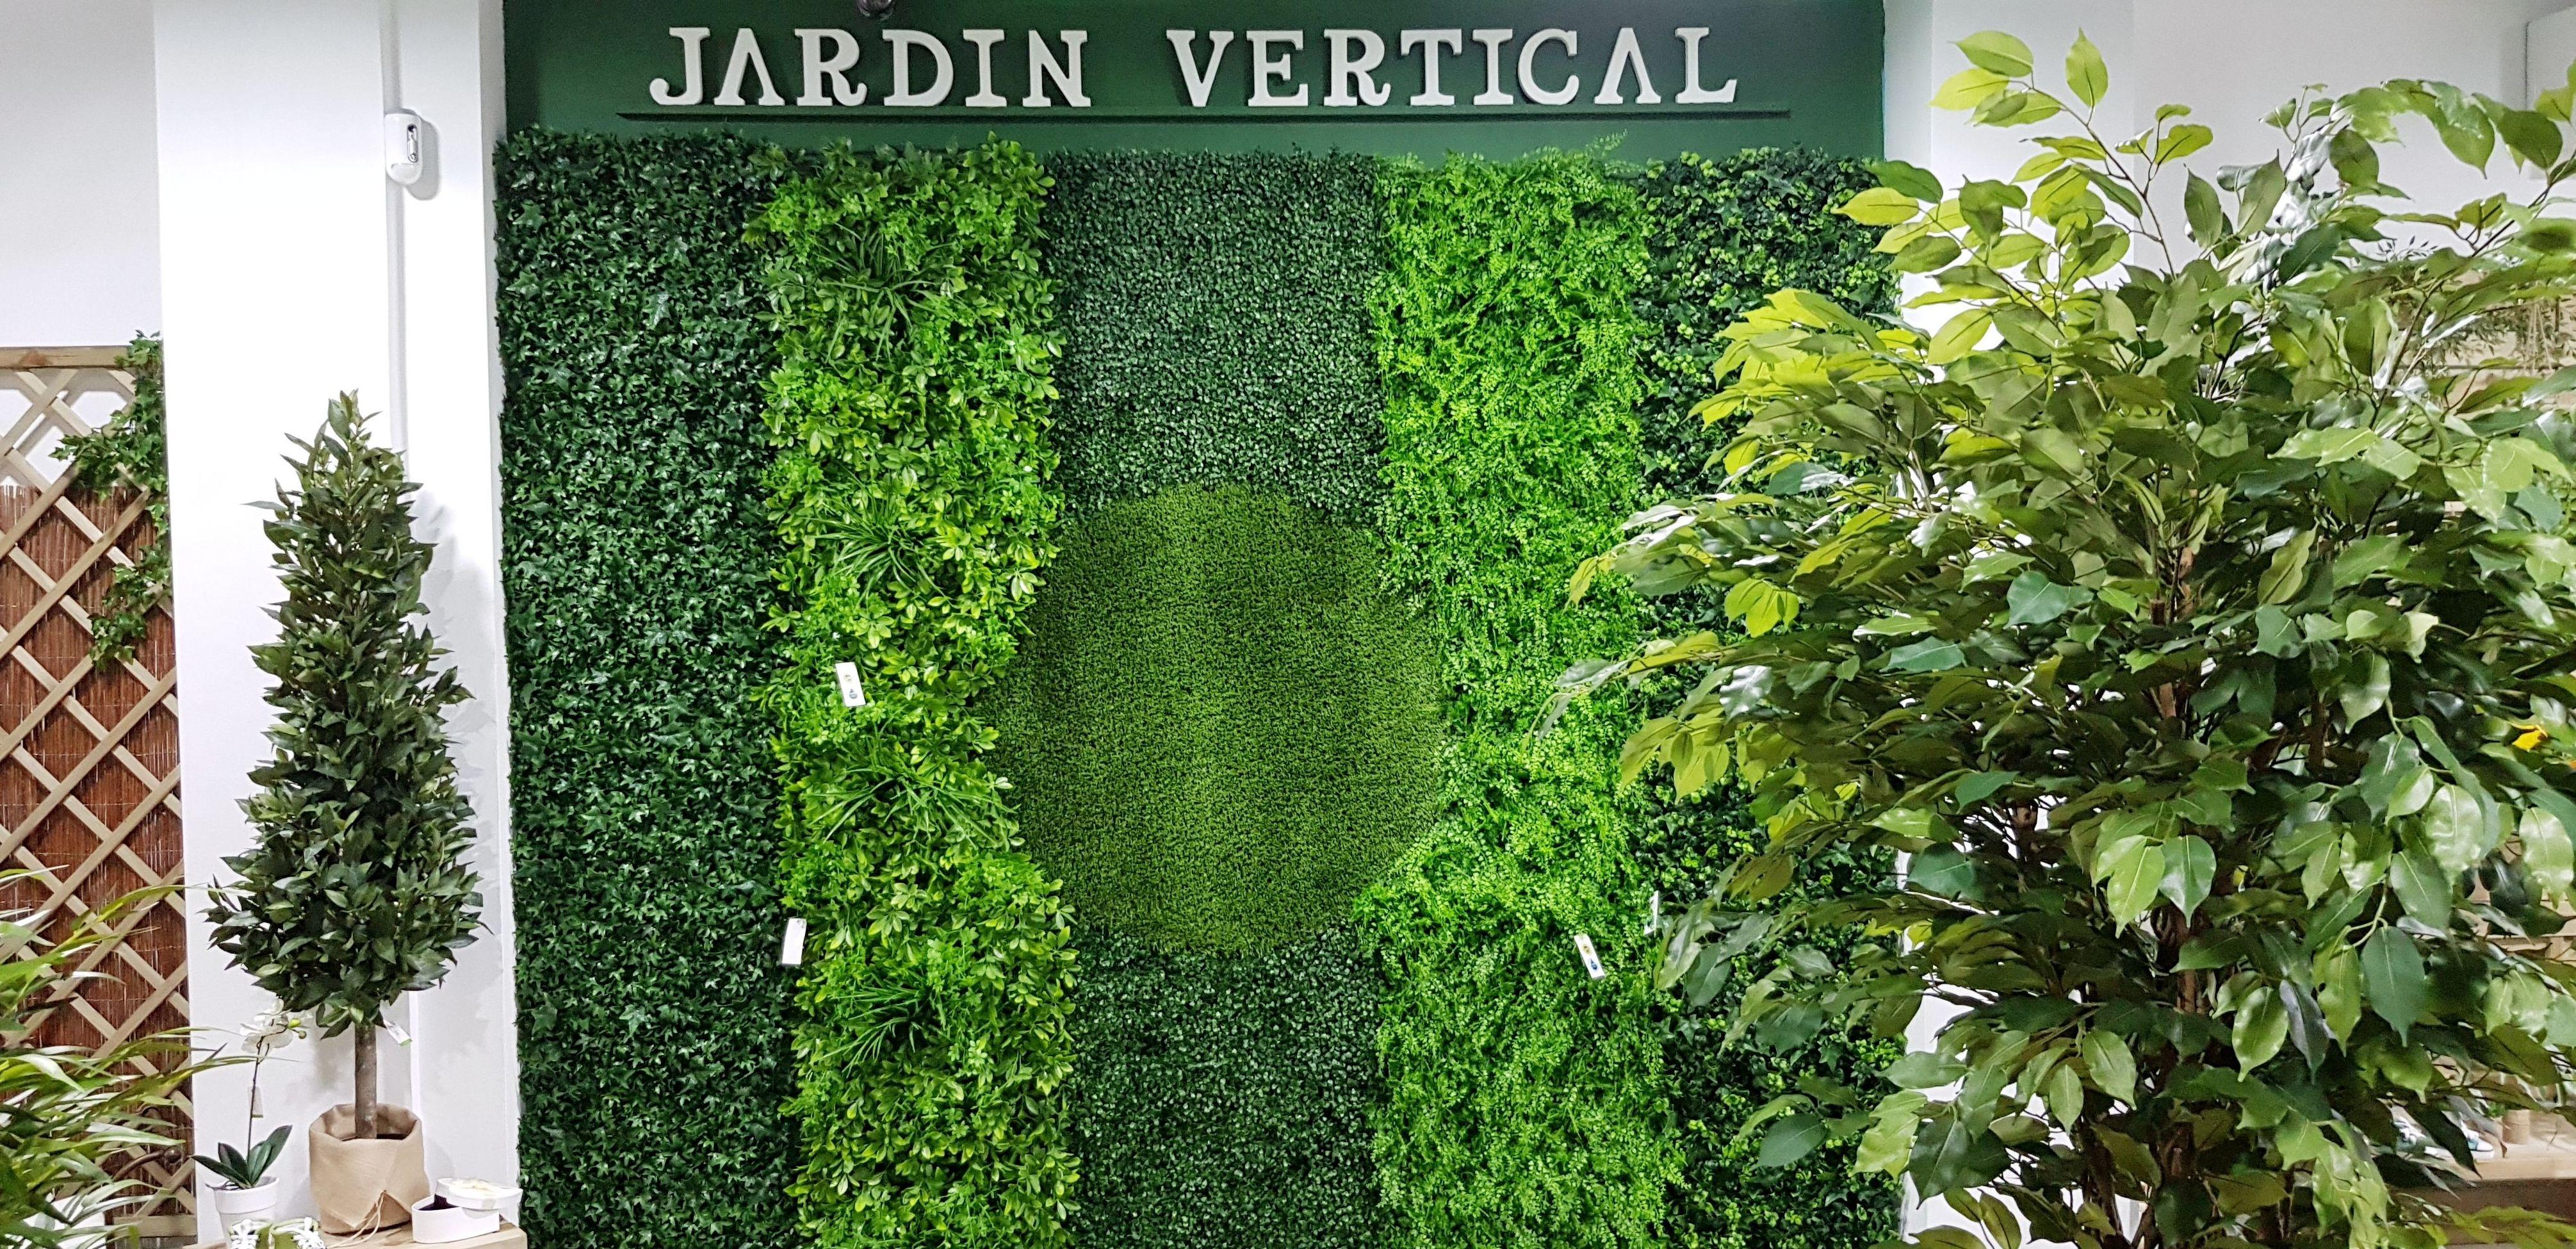 Modelos de jardín vertical para exterior